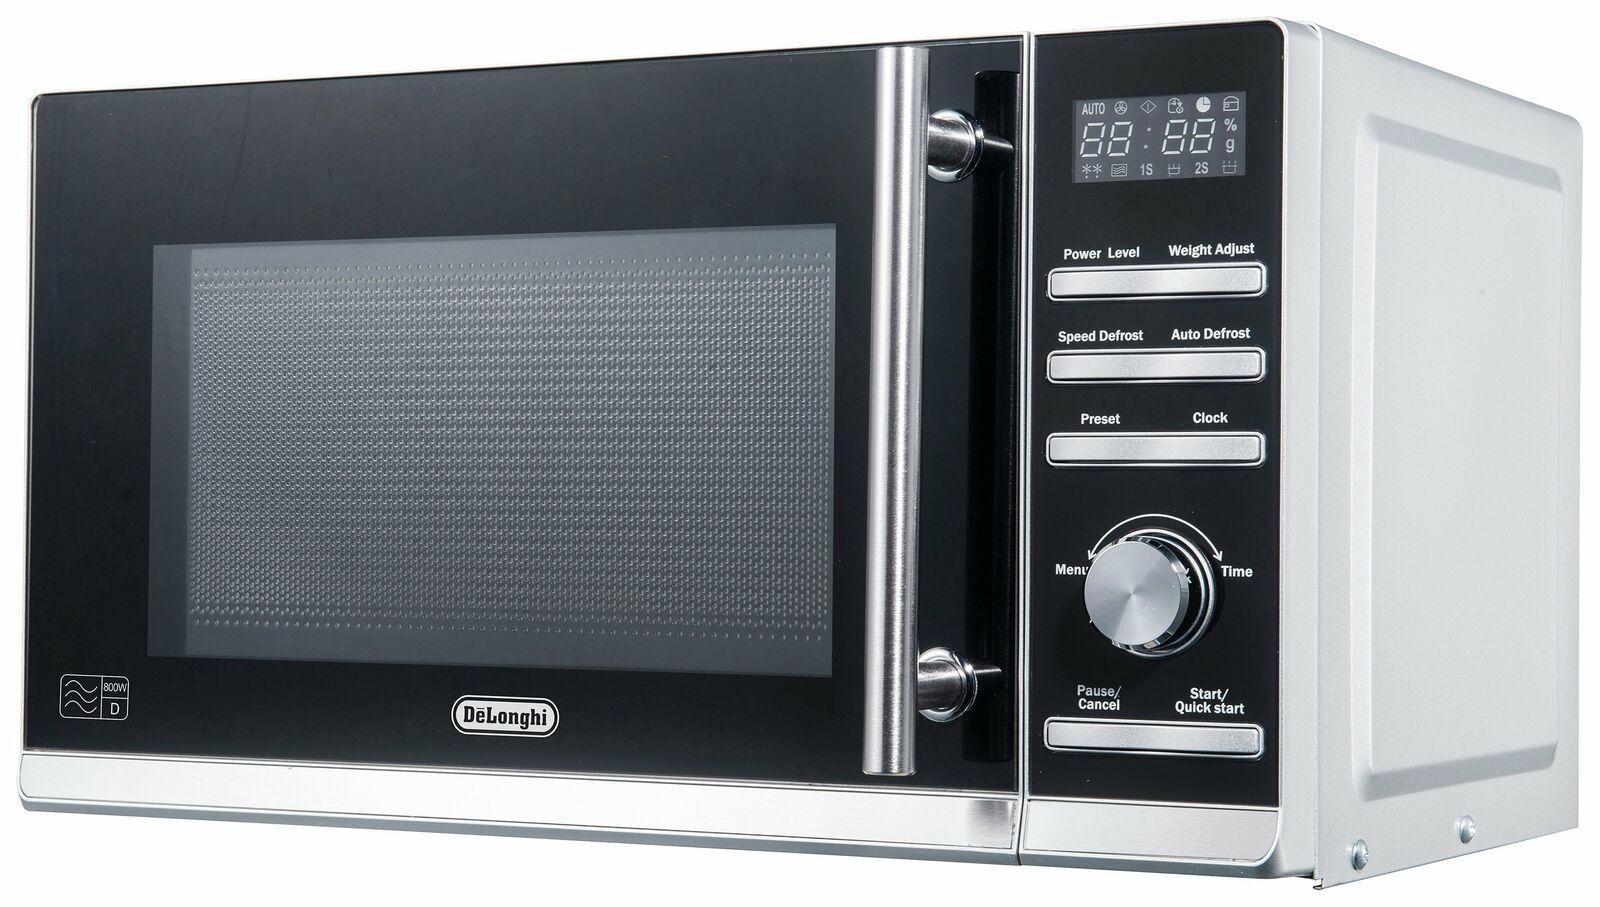 De'Longhi P80ZVA 20L 800W Standard Microwave - Stainless Steel £49.99 delivered (UK Mainland) @ Argos on eBay